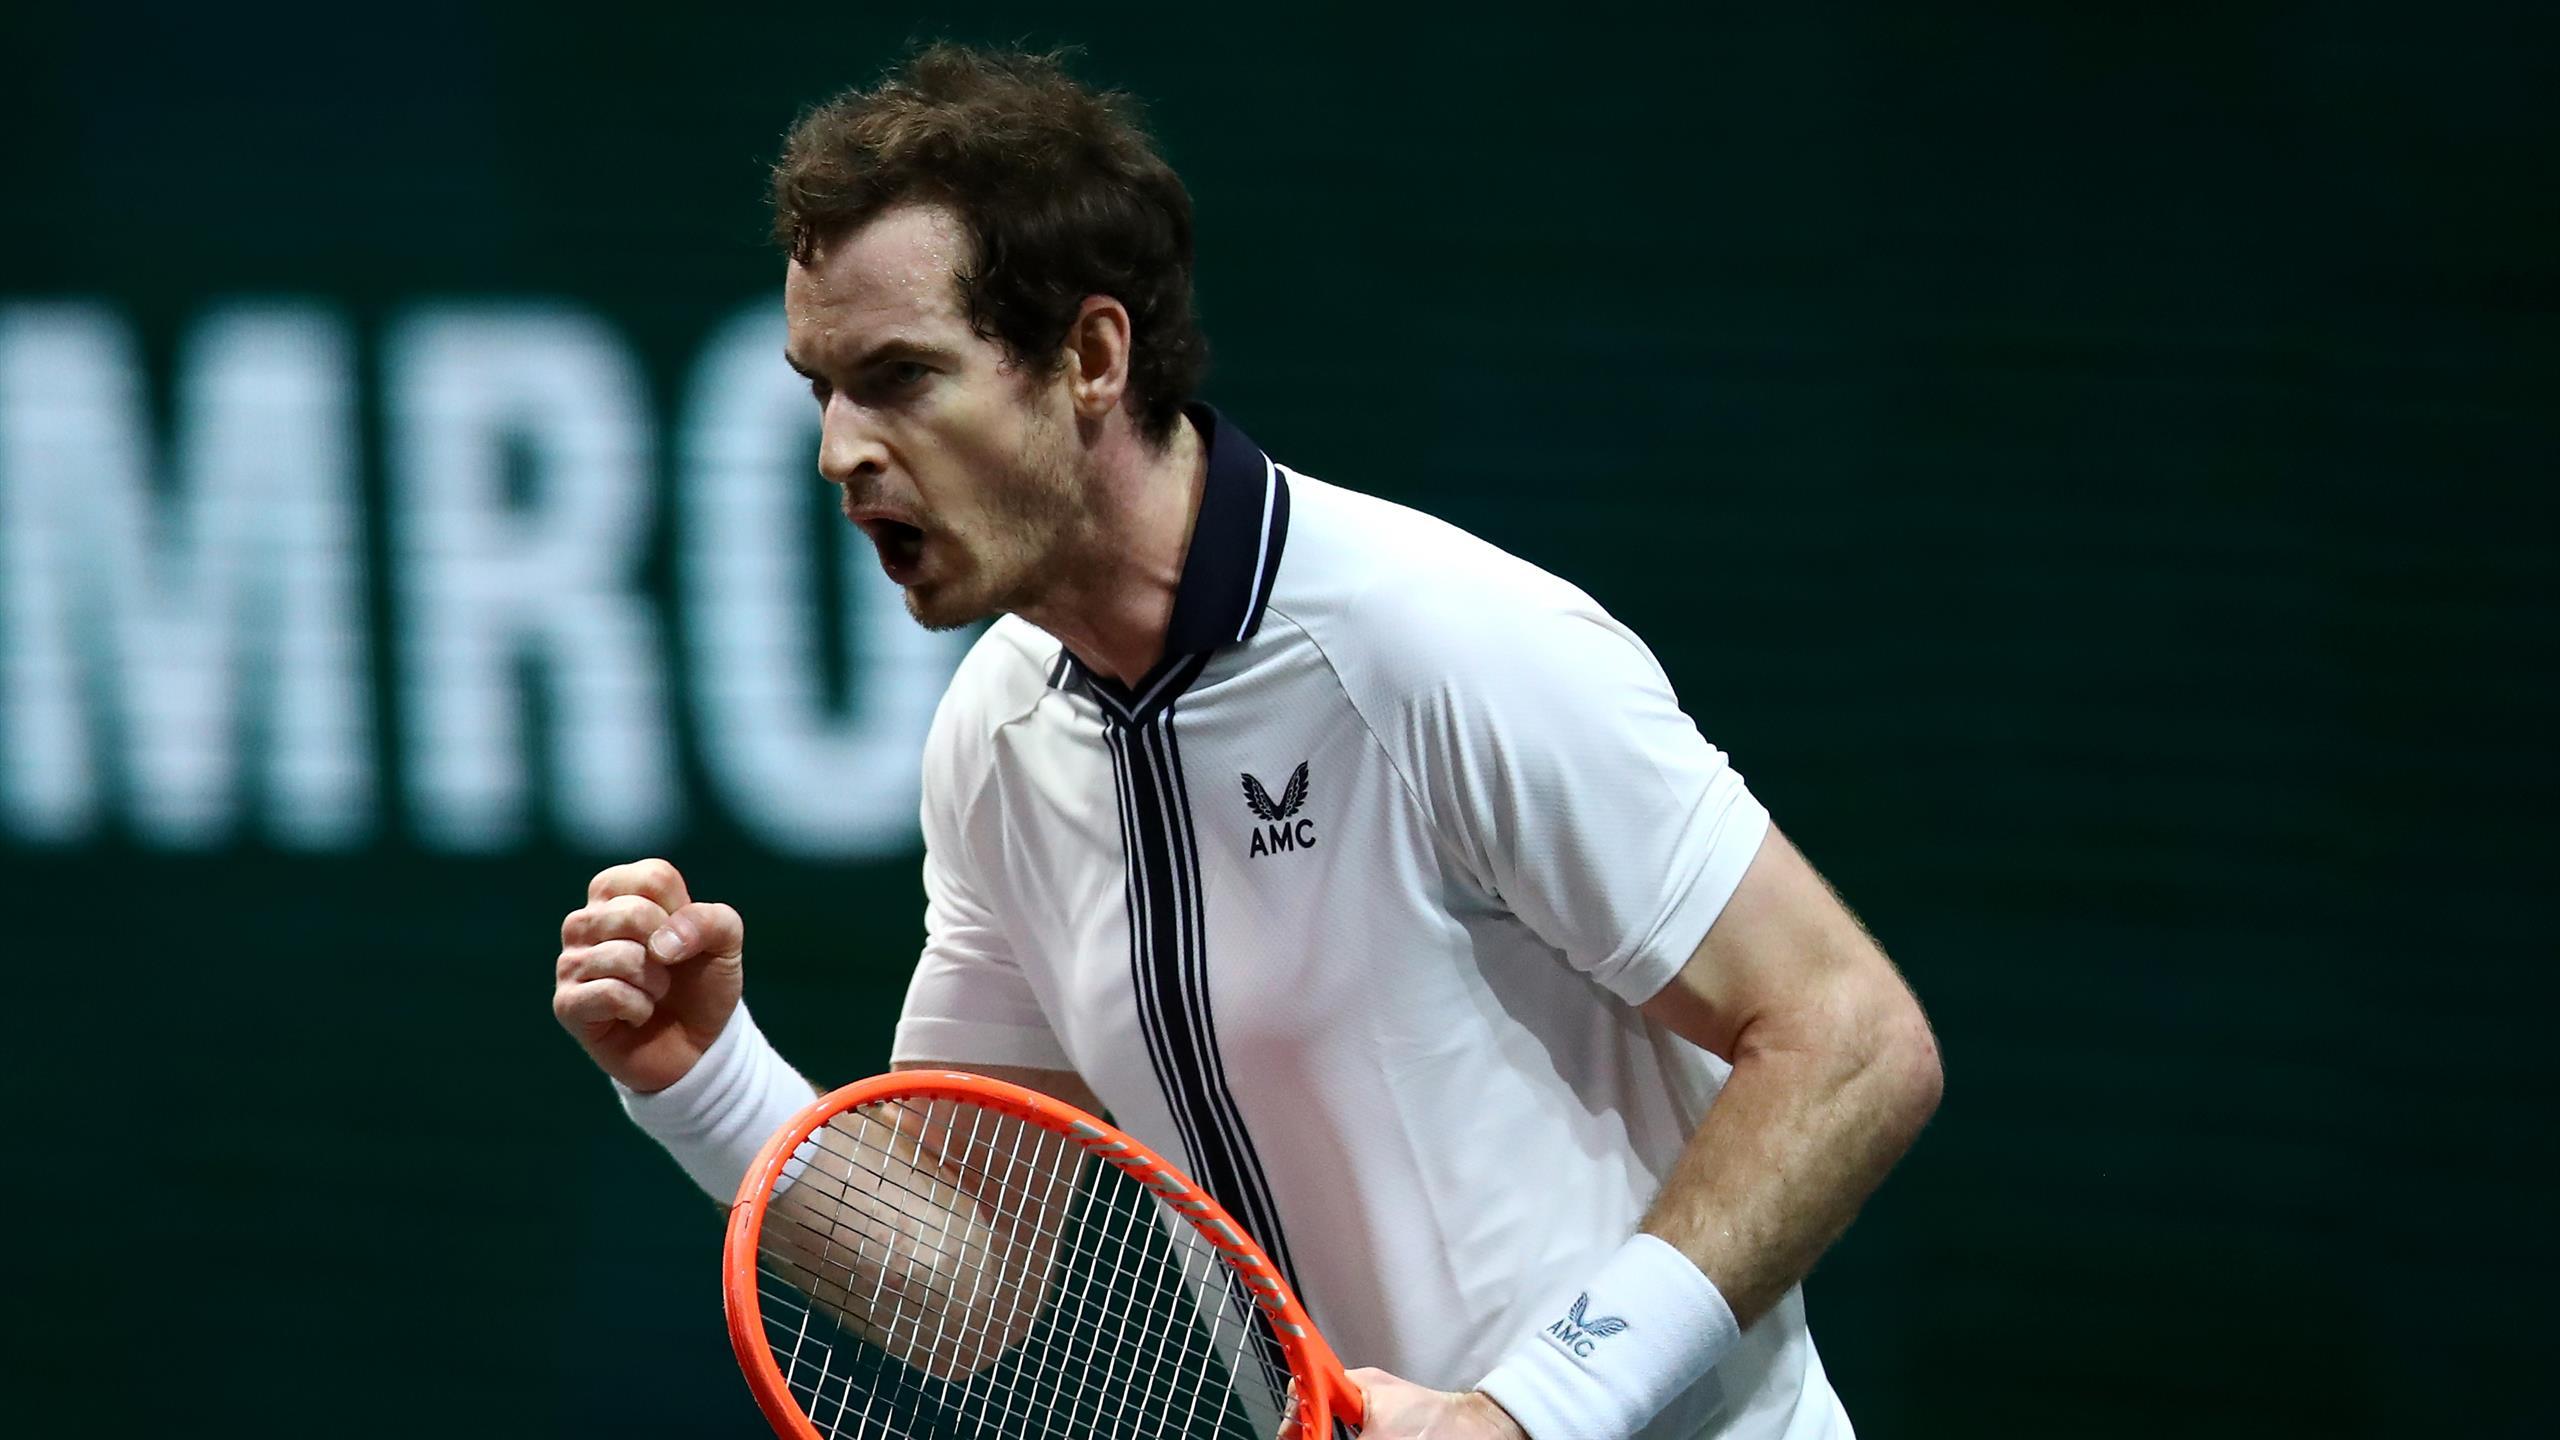 ATP ROTTERDAM : Andy Murray bat Robin Haase (2-6, 7-6 (7-2), 6-3) - Eurosport FR